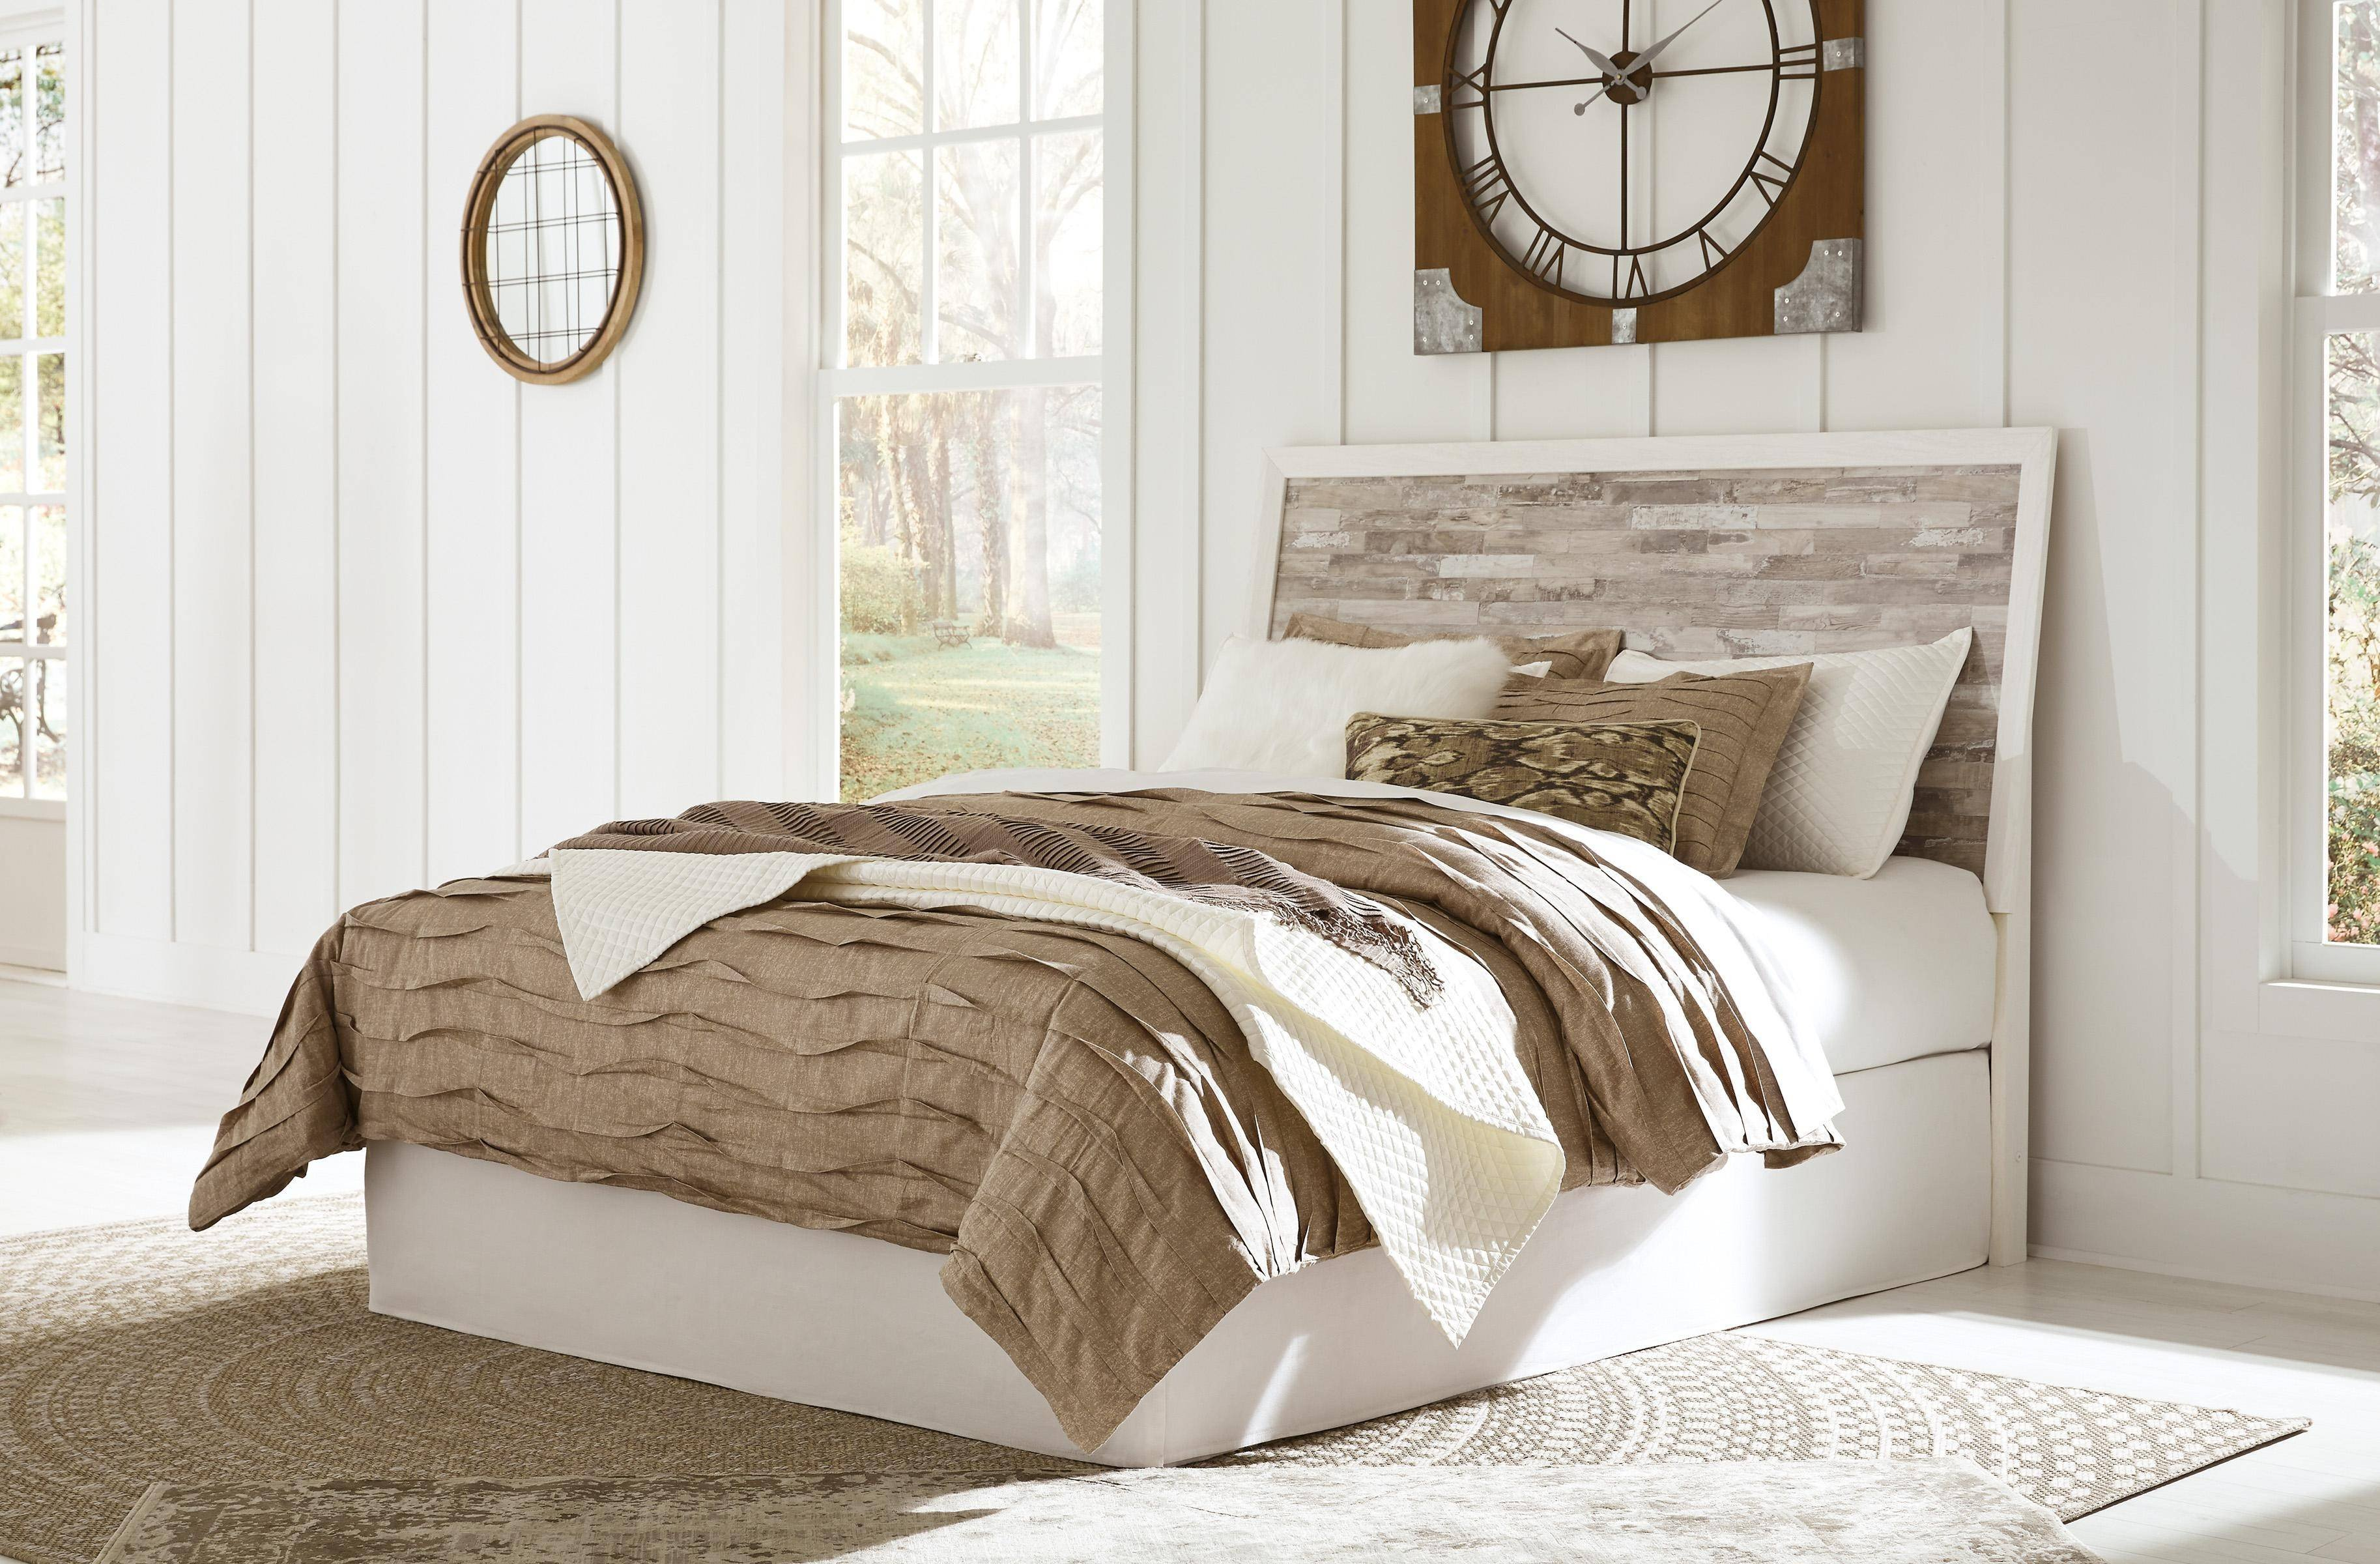 Cheap Bedroom Set Online Fresh ashley Evanni B315 Queen Size Platform Bedroom Set 6pcs In